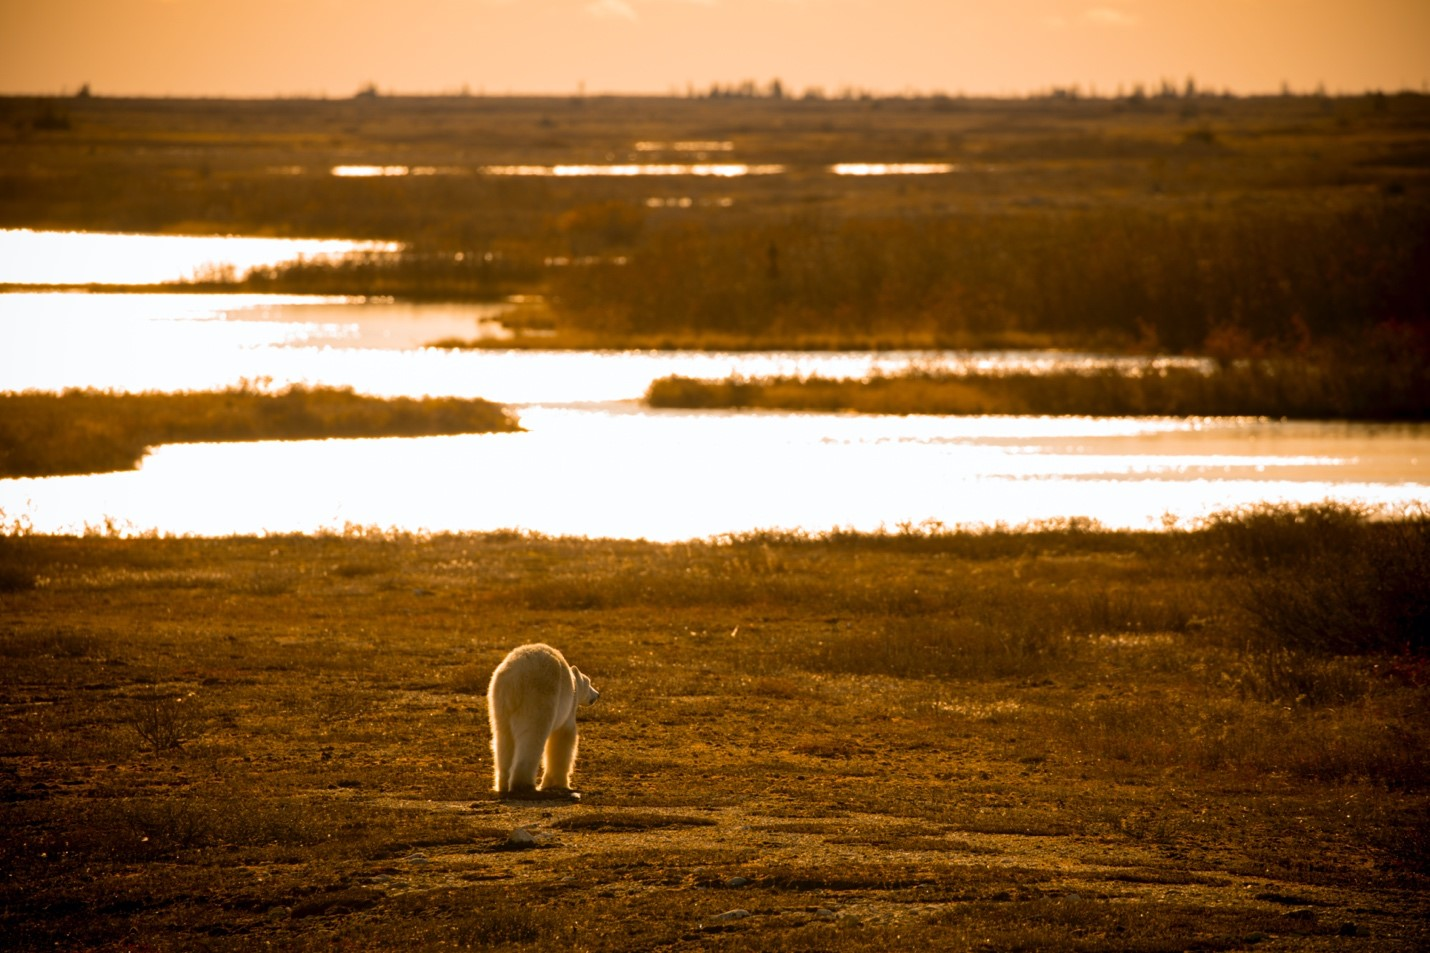 a sun rises and provides golden light to a walking polar bear